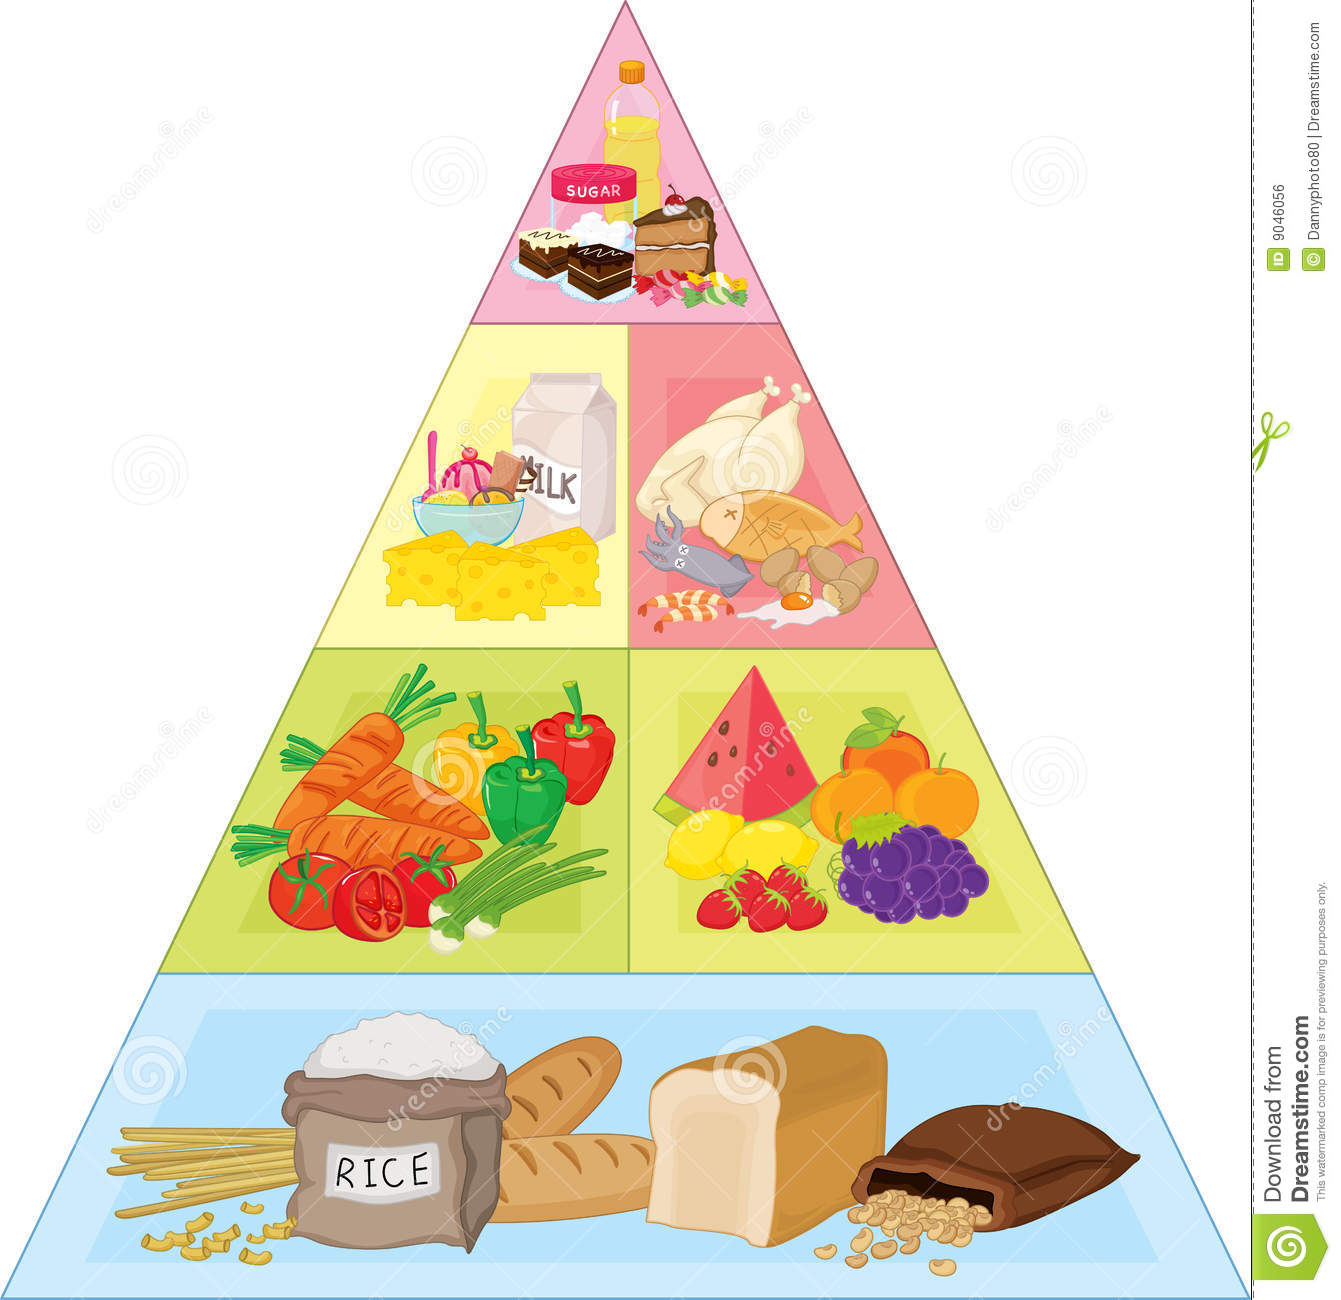 Food Pyramid Royalty Free .-Food Pyramid Royalty Free .-6